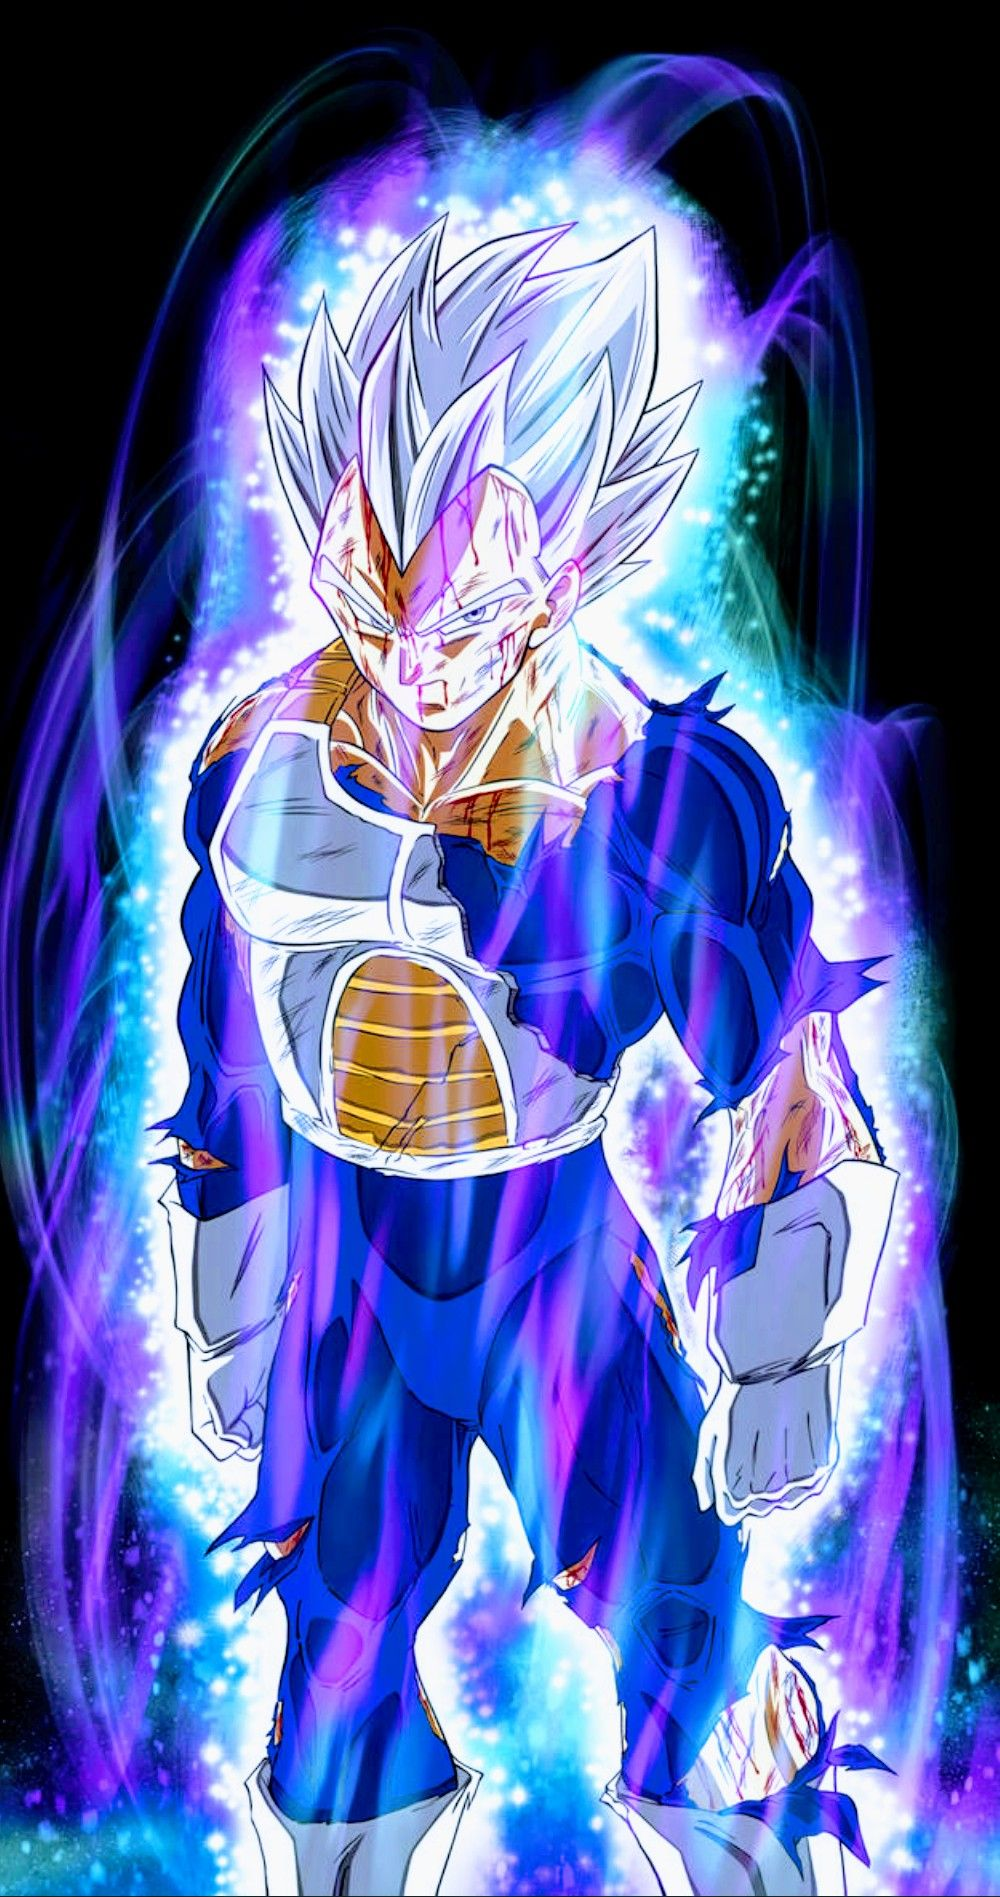 Vegeta Ultra Instinct Mastered Dragon Ball Super Dragon Ball Super Manga Dragon Ball Super Wallpapers Dragon Ball Super